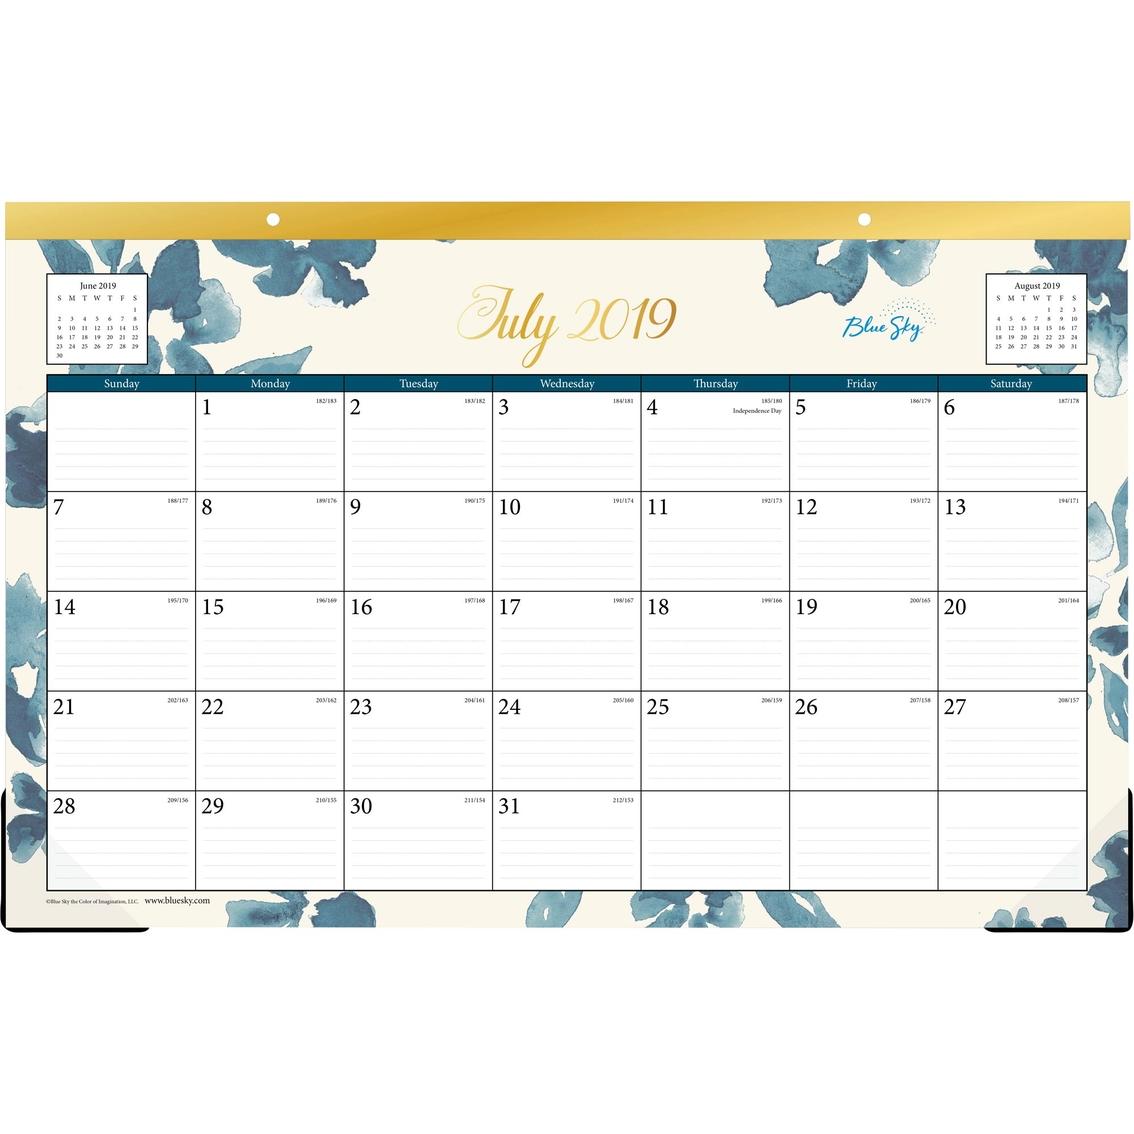 July Calendar For 2020.Blue Sky July 2019 July 2020 Desk Pad Calendar Bakah Blue